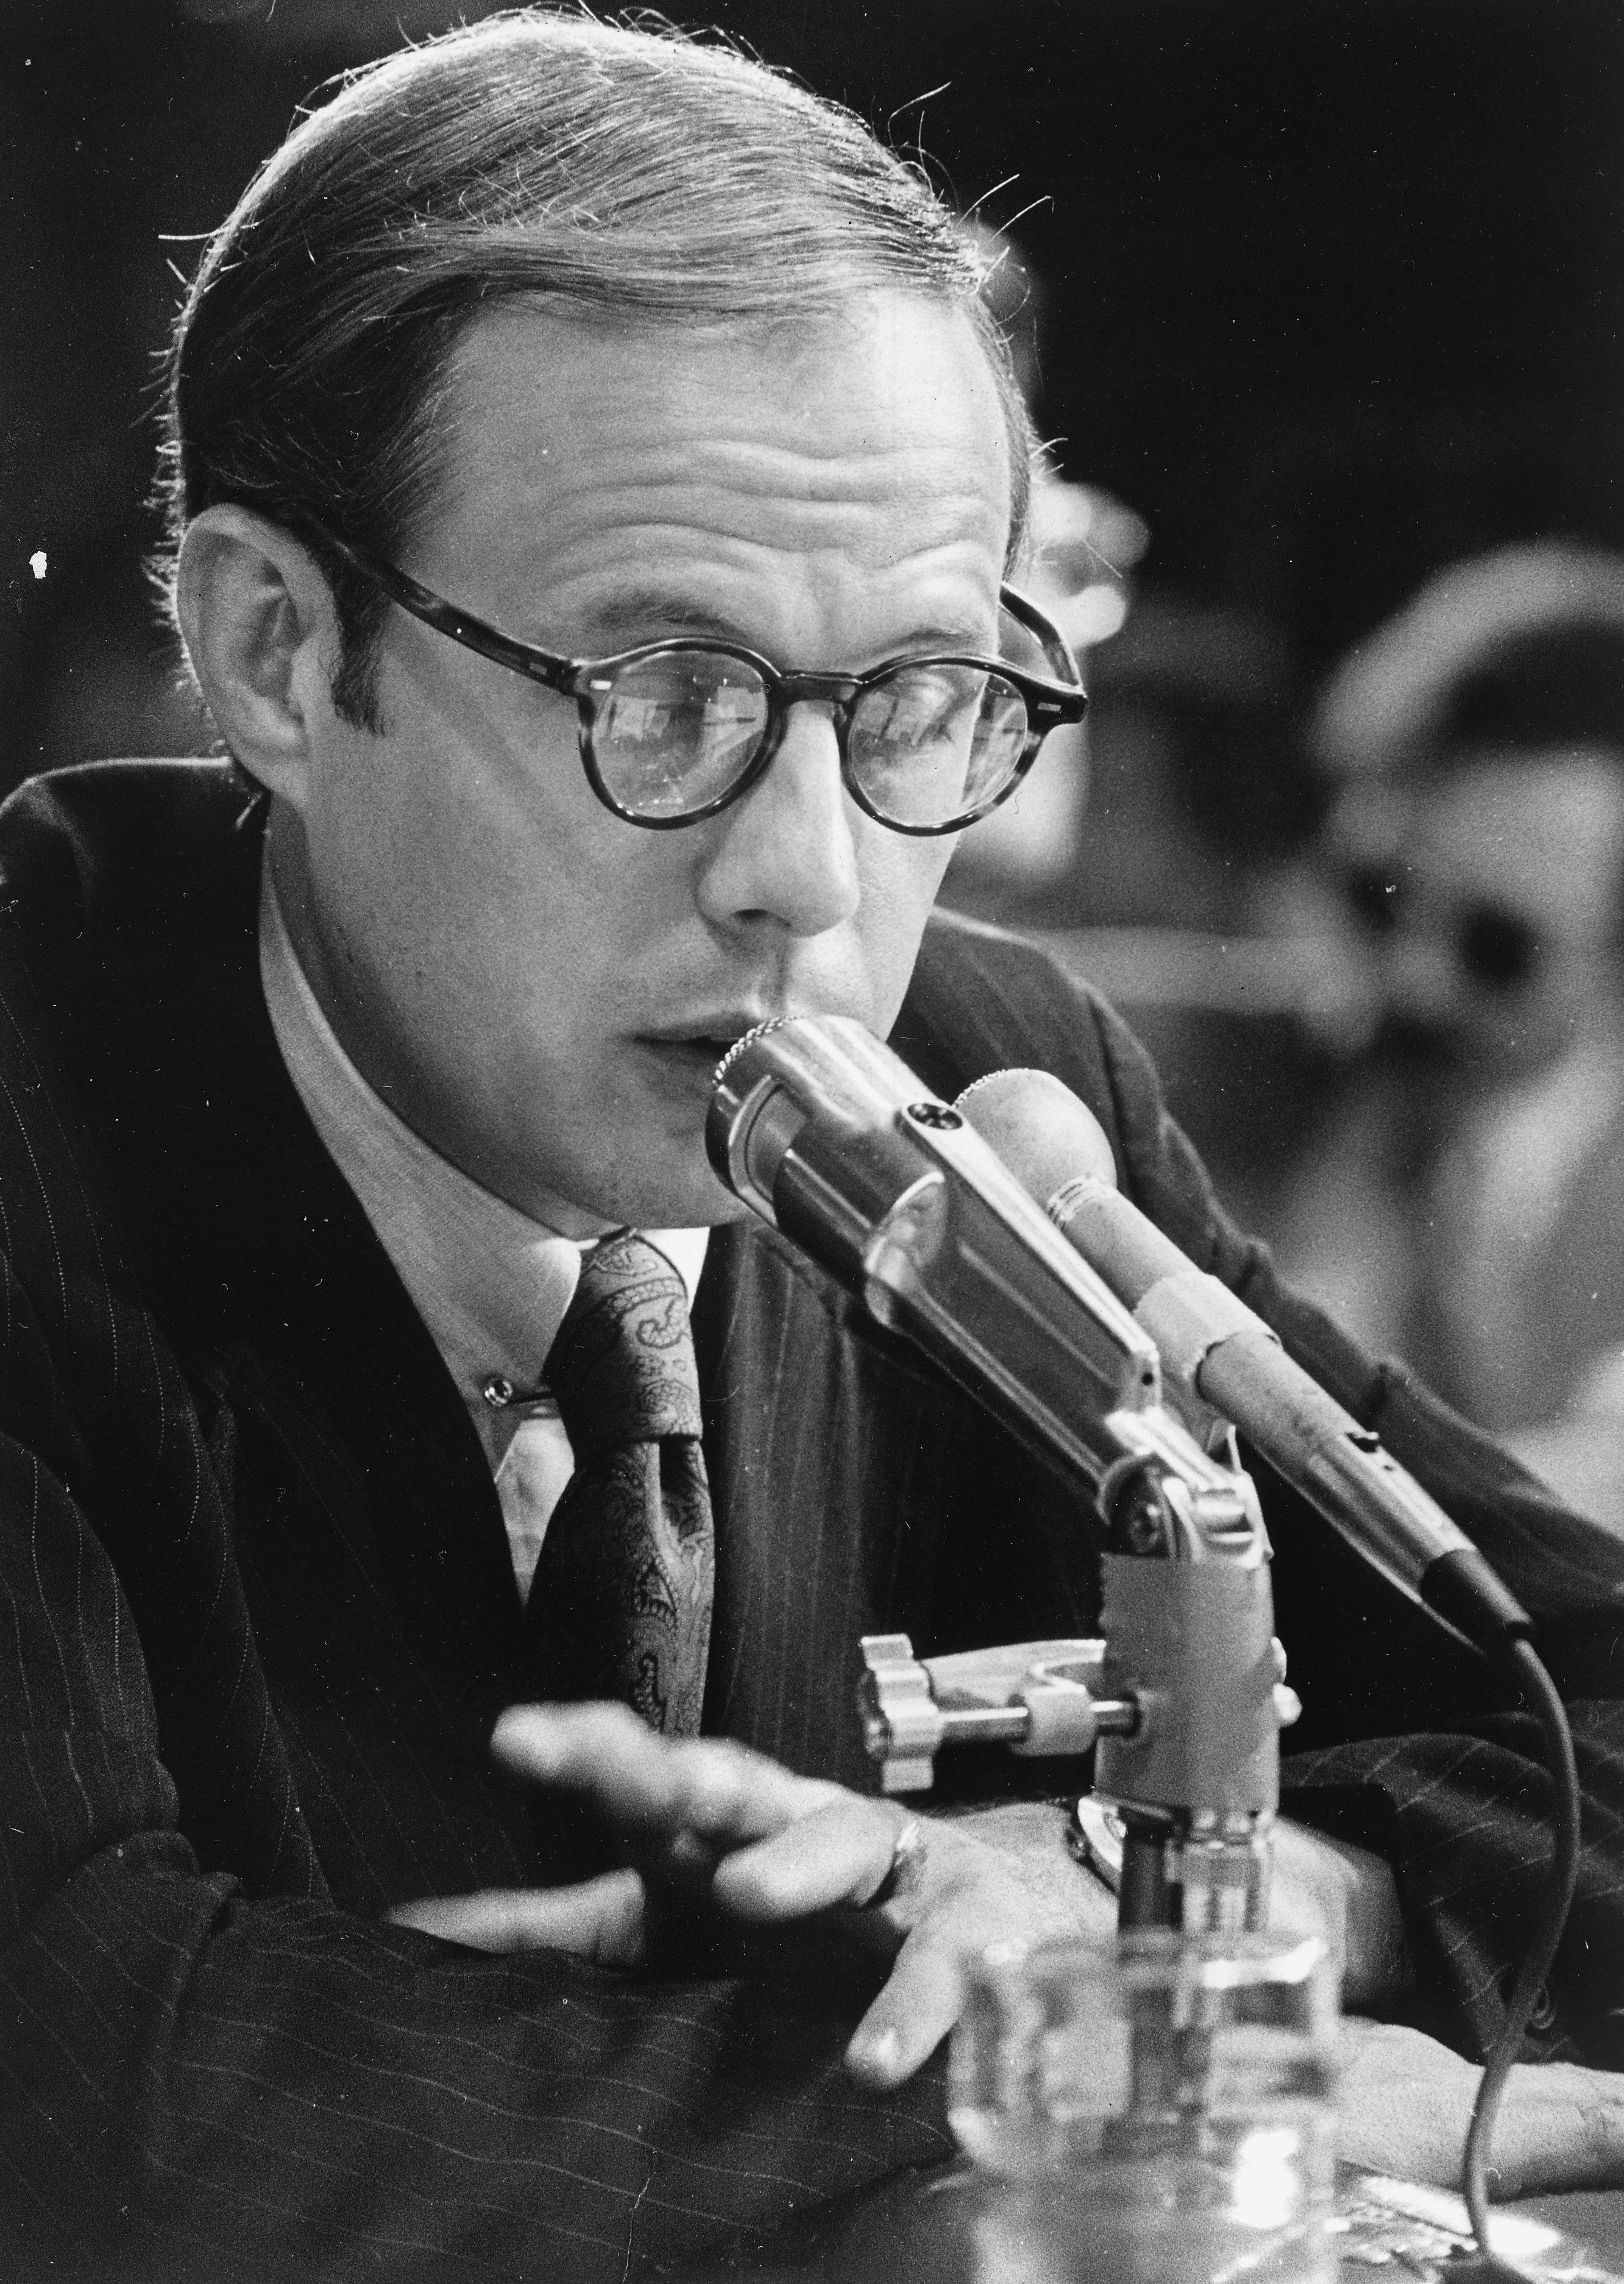 John Dean testifies before the Senate Watergate Investigating Committee in June 1973. Then-President Nixonwould resign